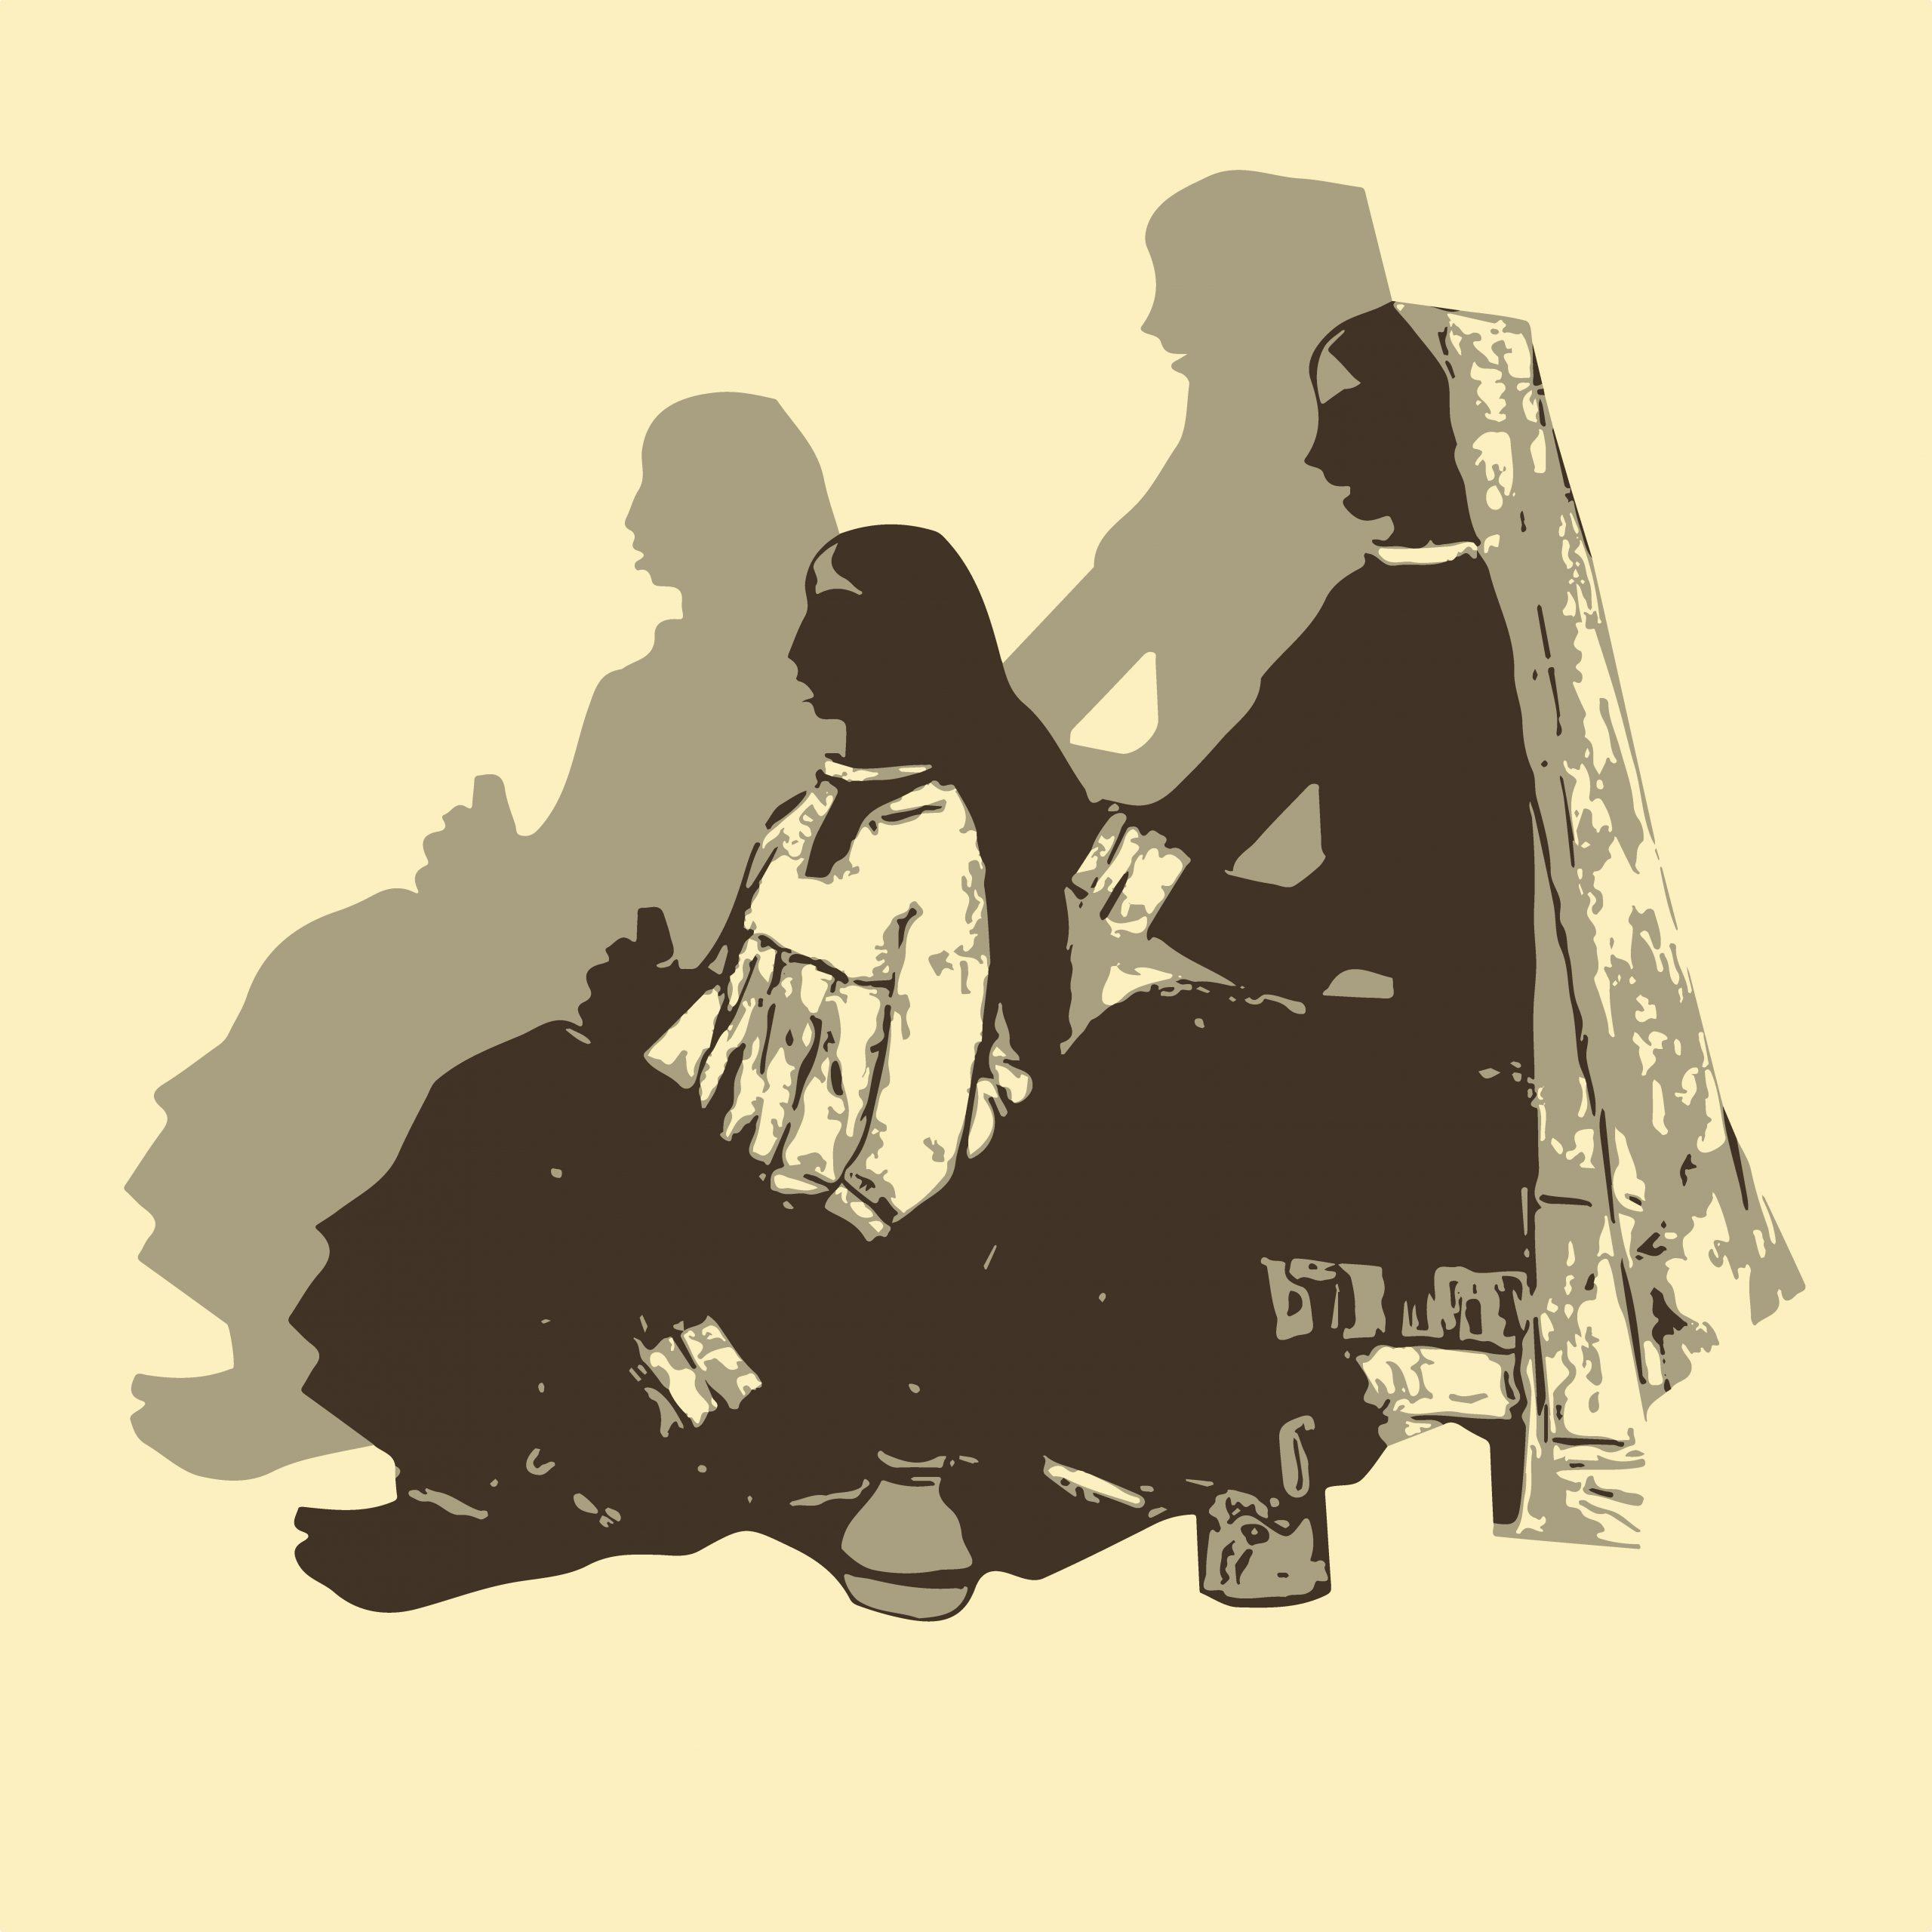 ILLUSTRATION of two ladies